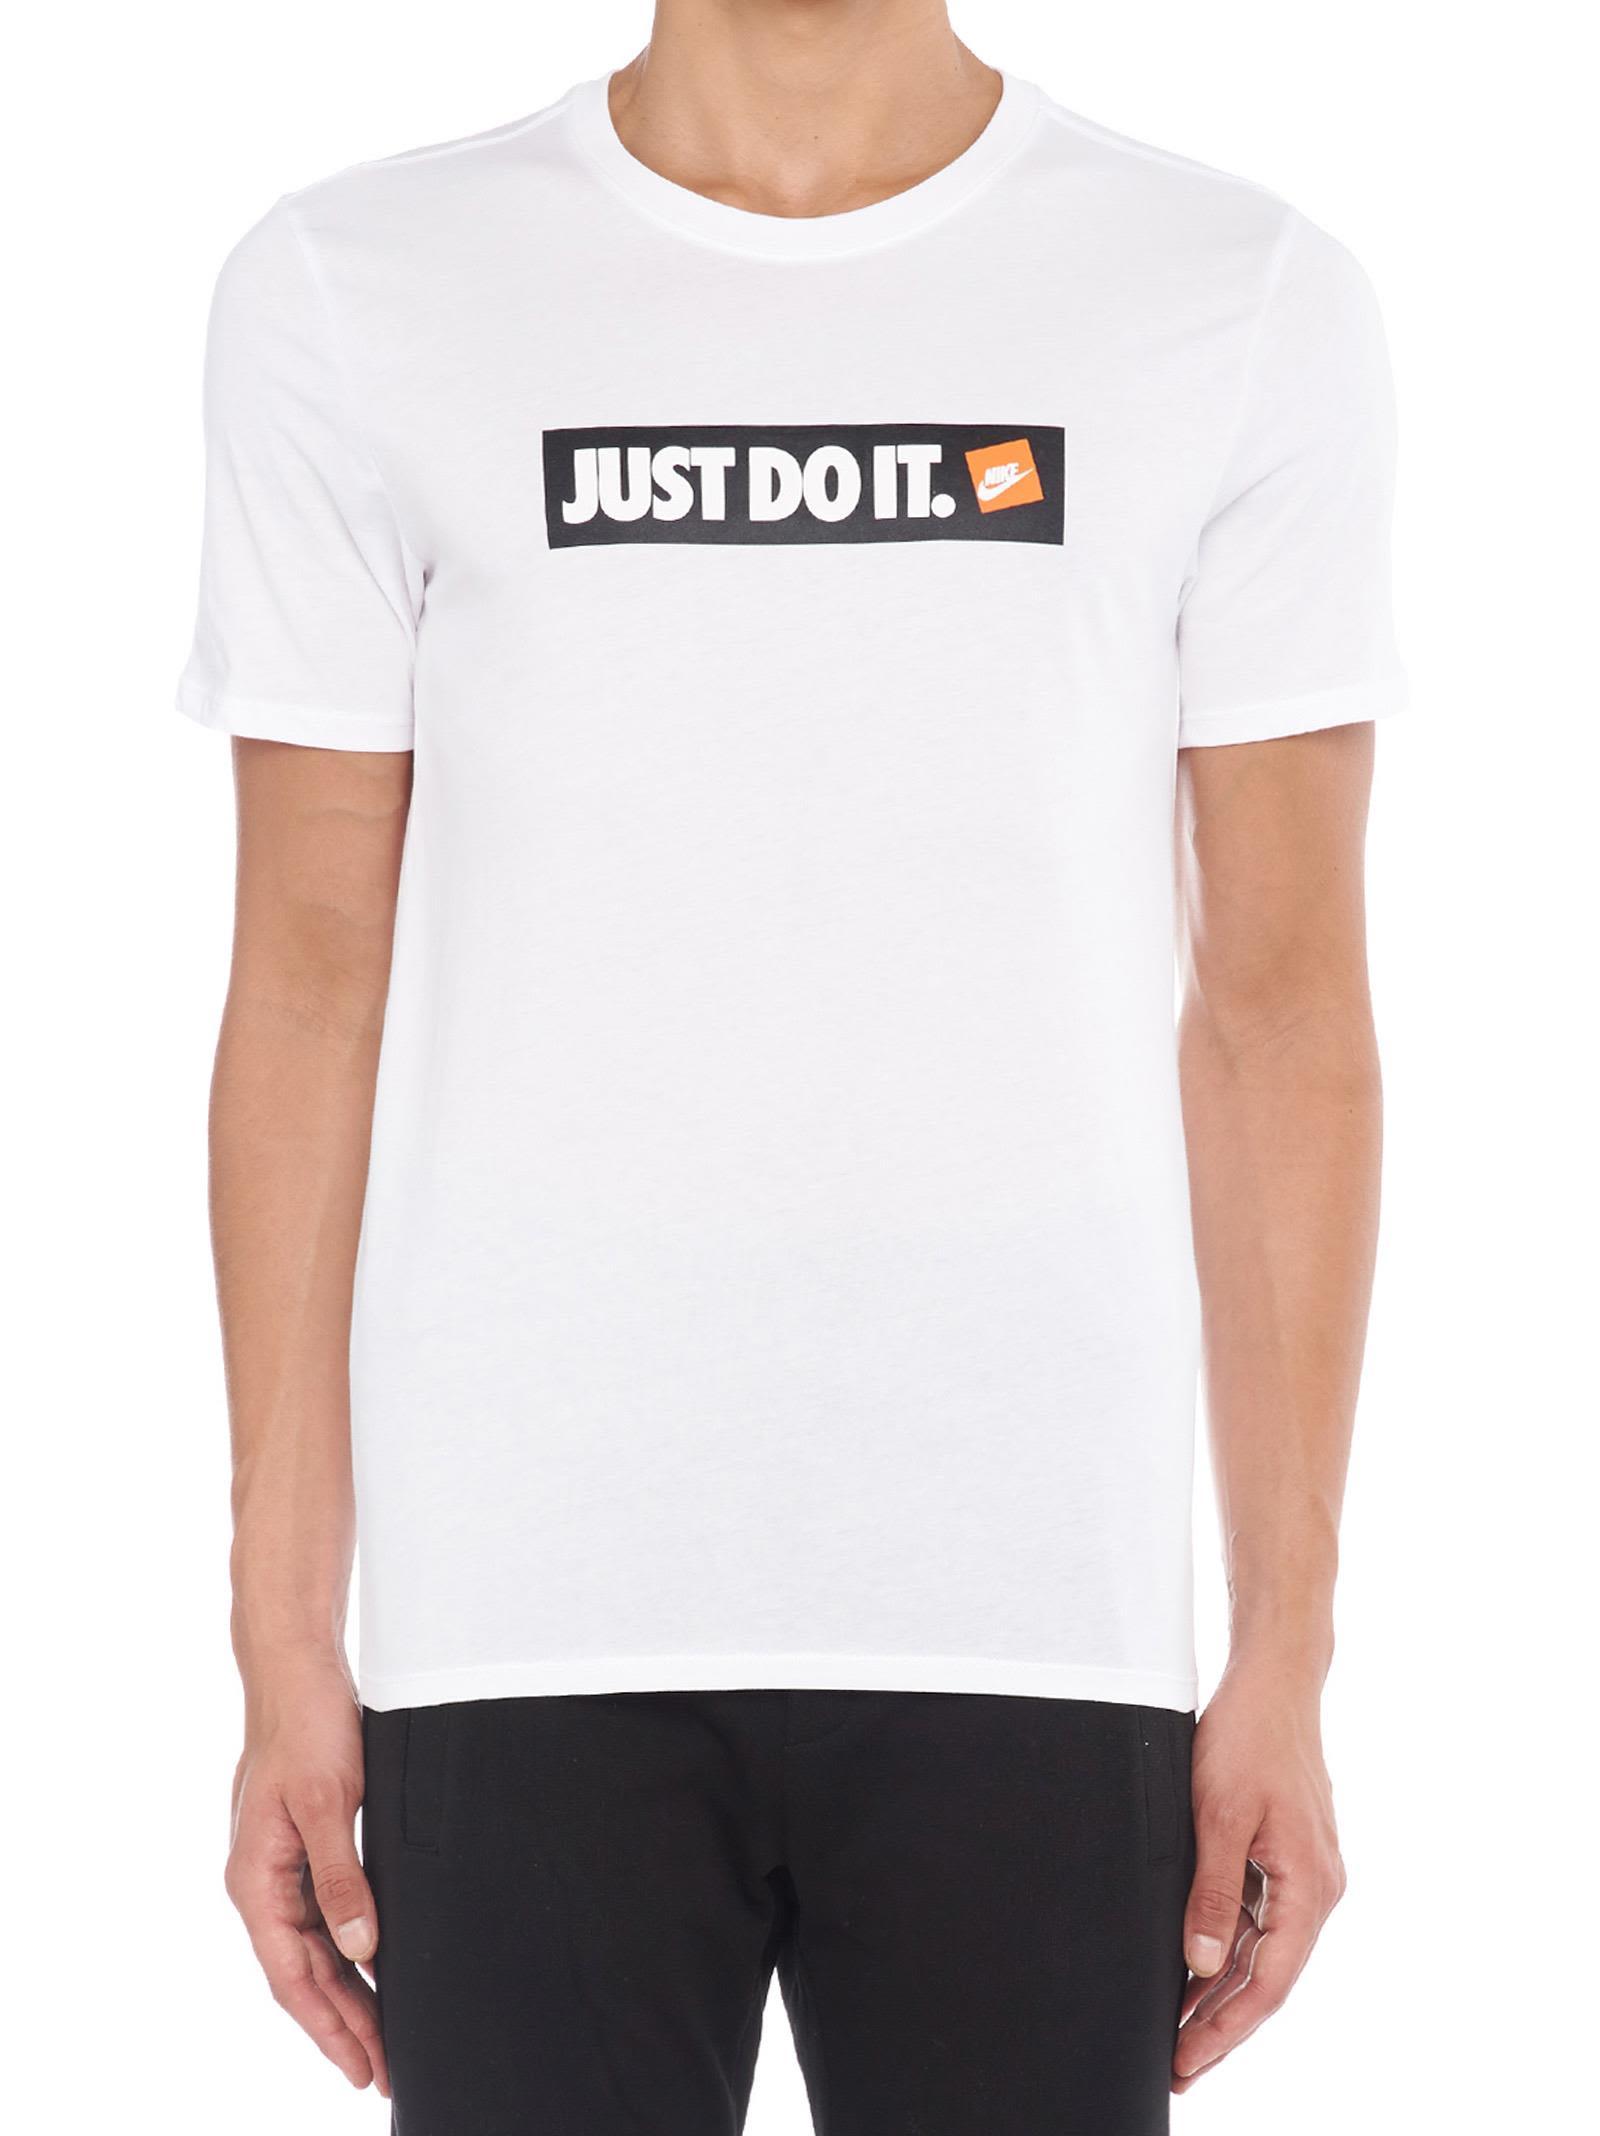 Nike Cottons T-SHIRT